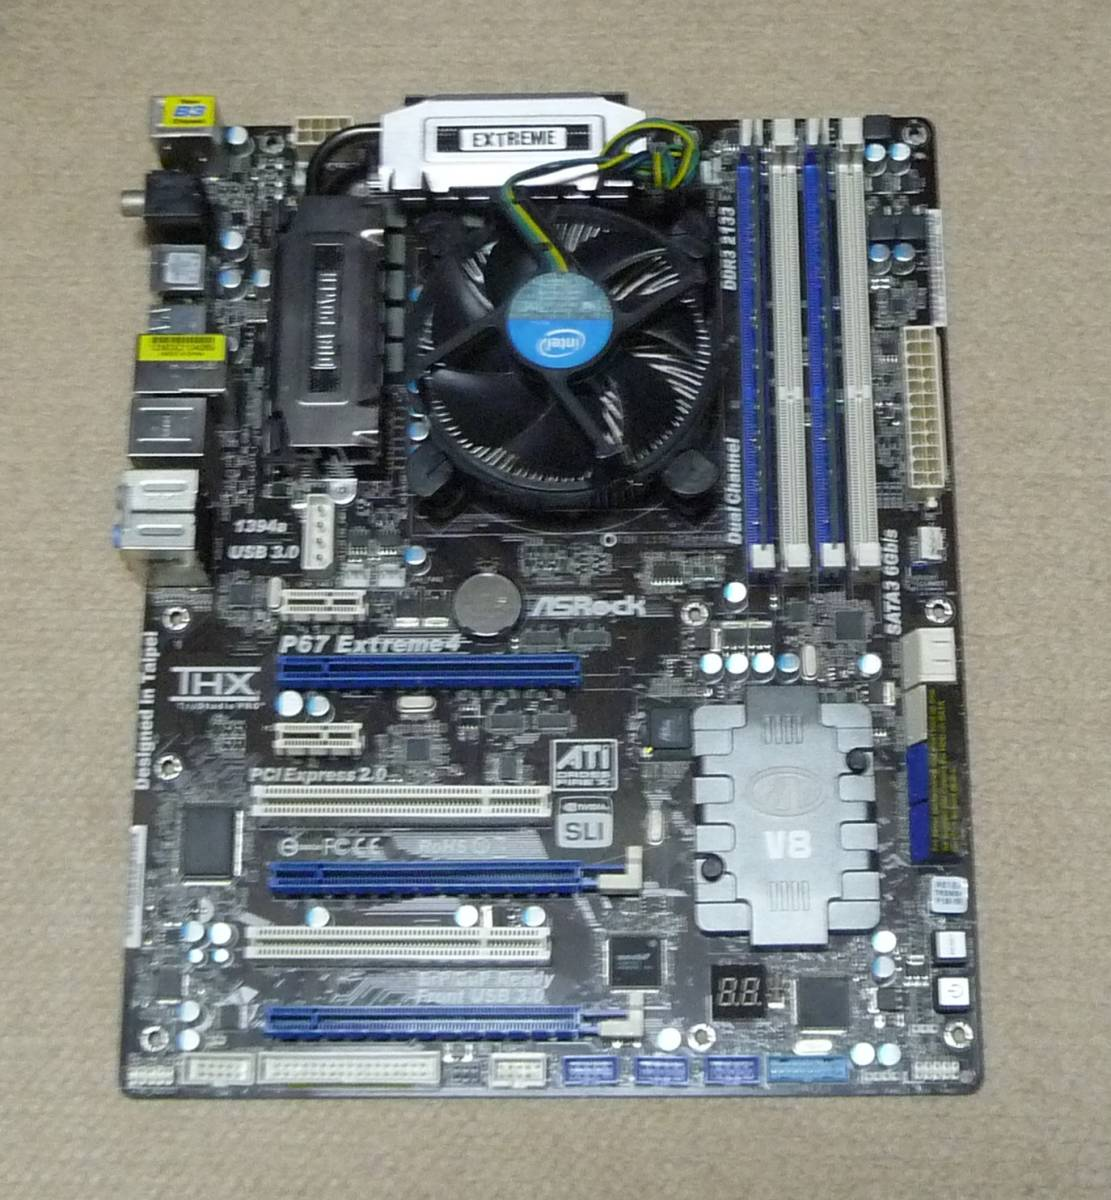 ☆ASRock P67 Extreme4 (LGA1155) + G1610 + 2GB Win10動作☆